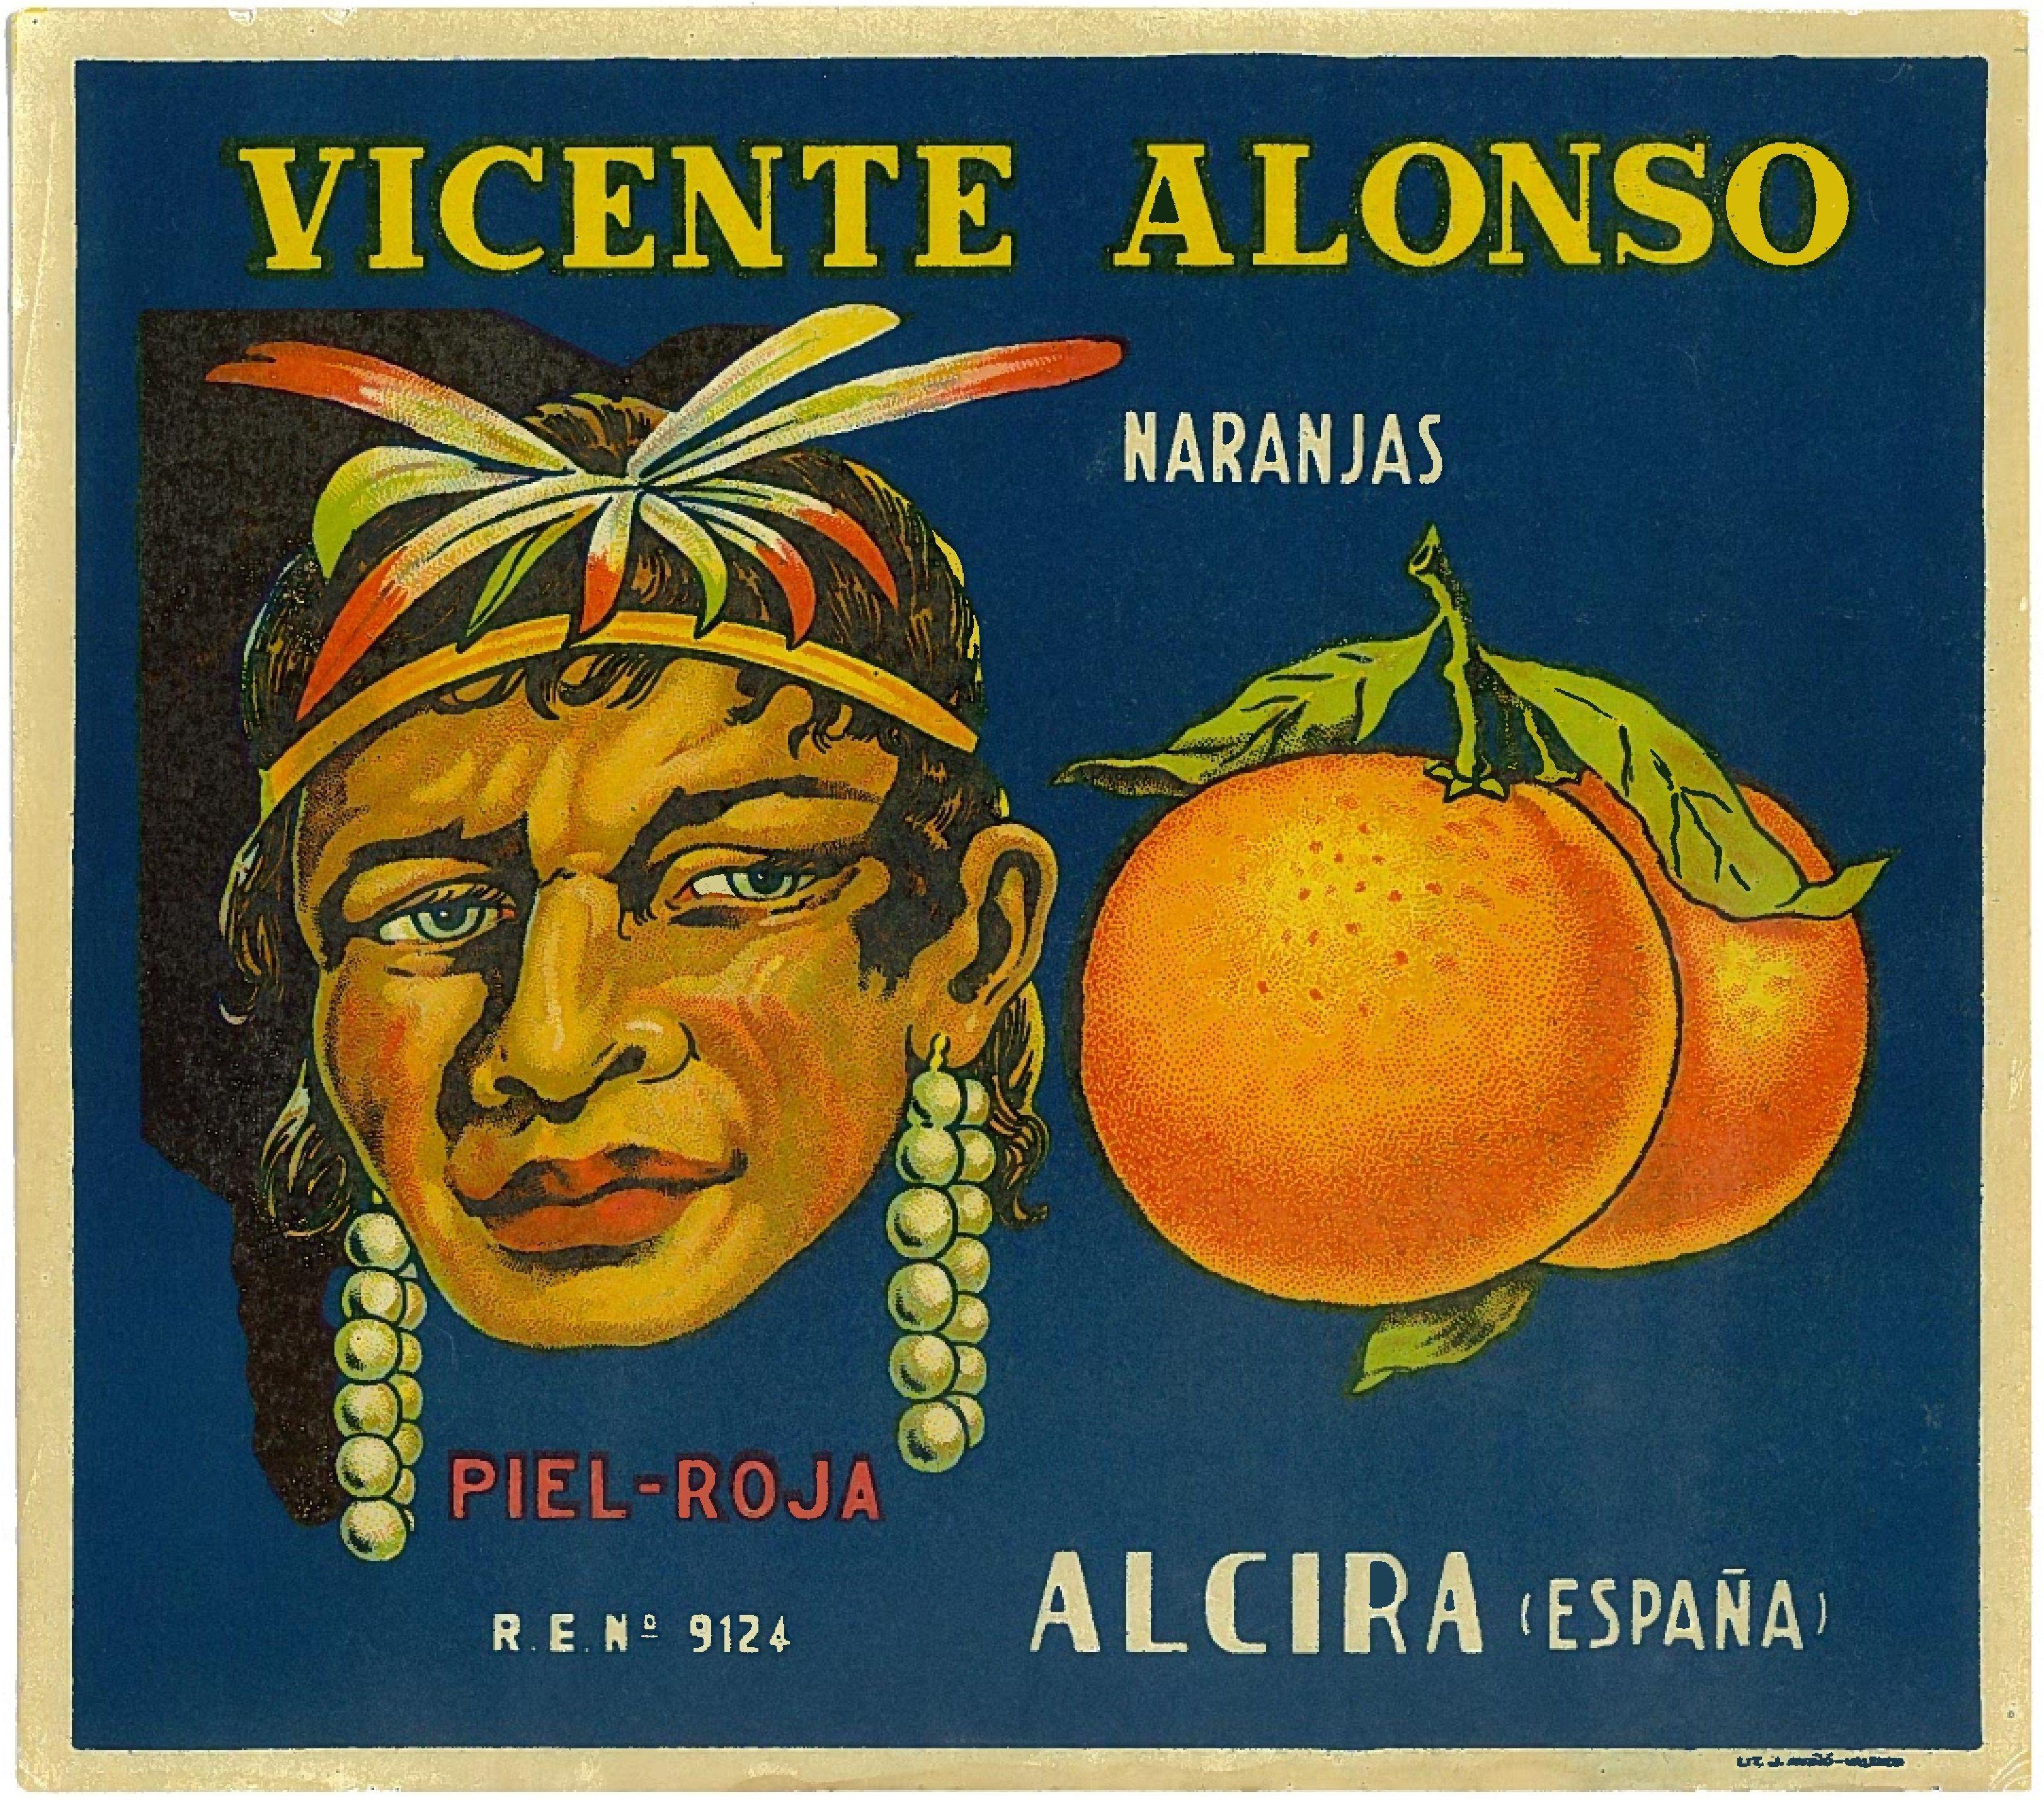 *Original* PRINCE OF WALES England Royal Florida Citrus Crate Label NOT A COPY!